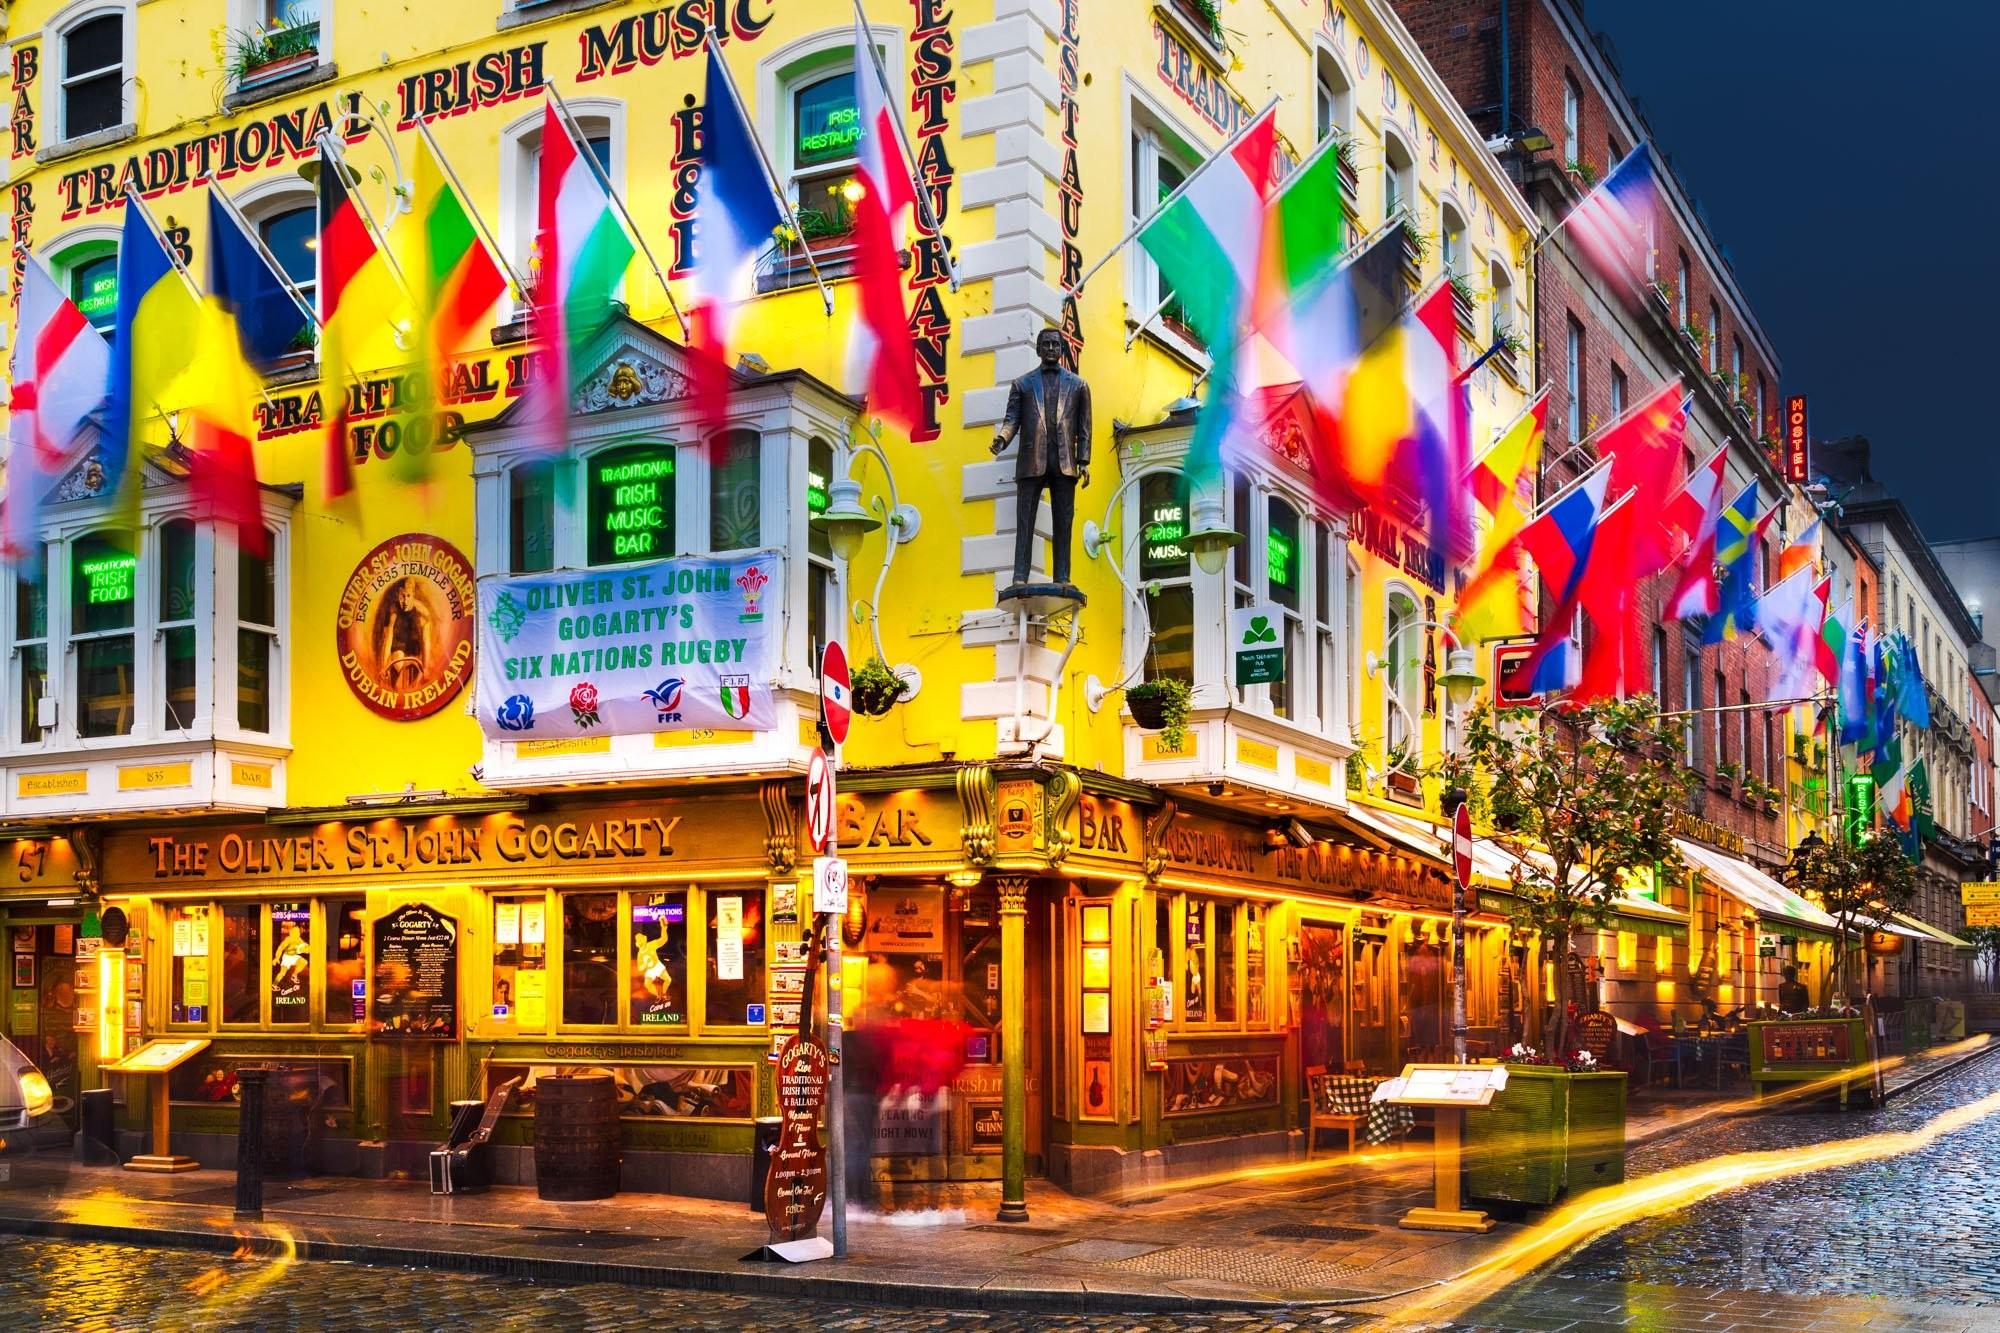 Temple Bar area during twilight, Dublin Ireland